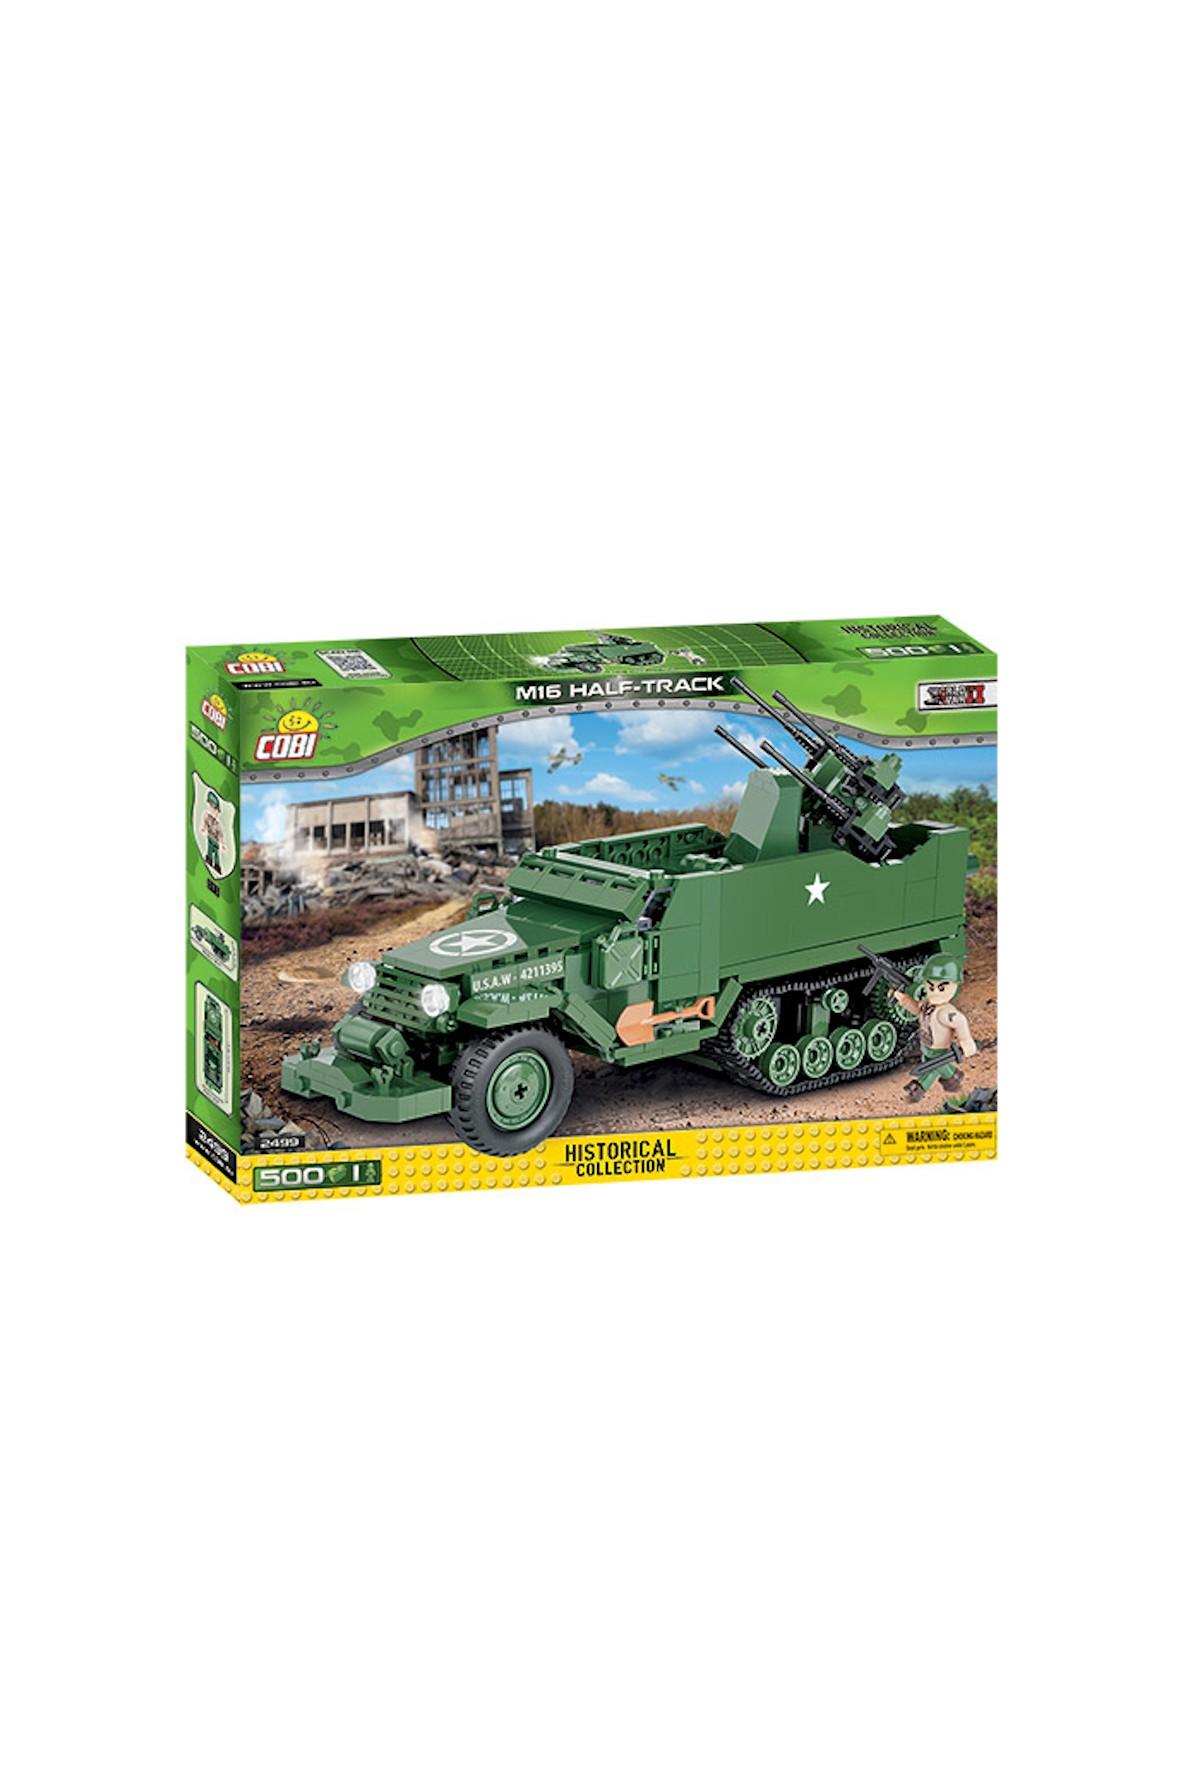 Klocki Small Army M-16 Alf-track 500el